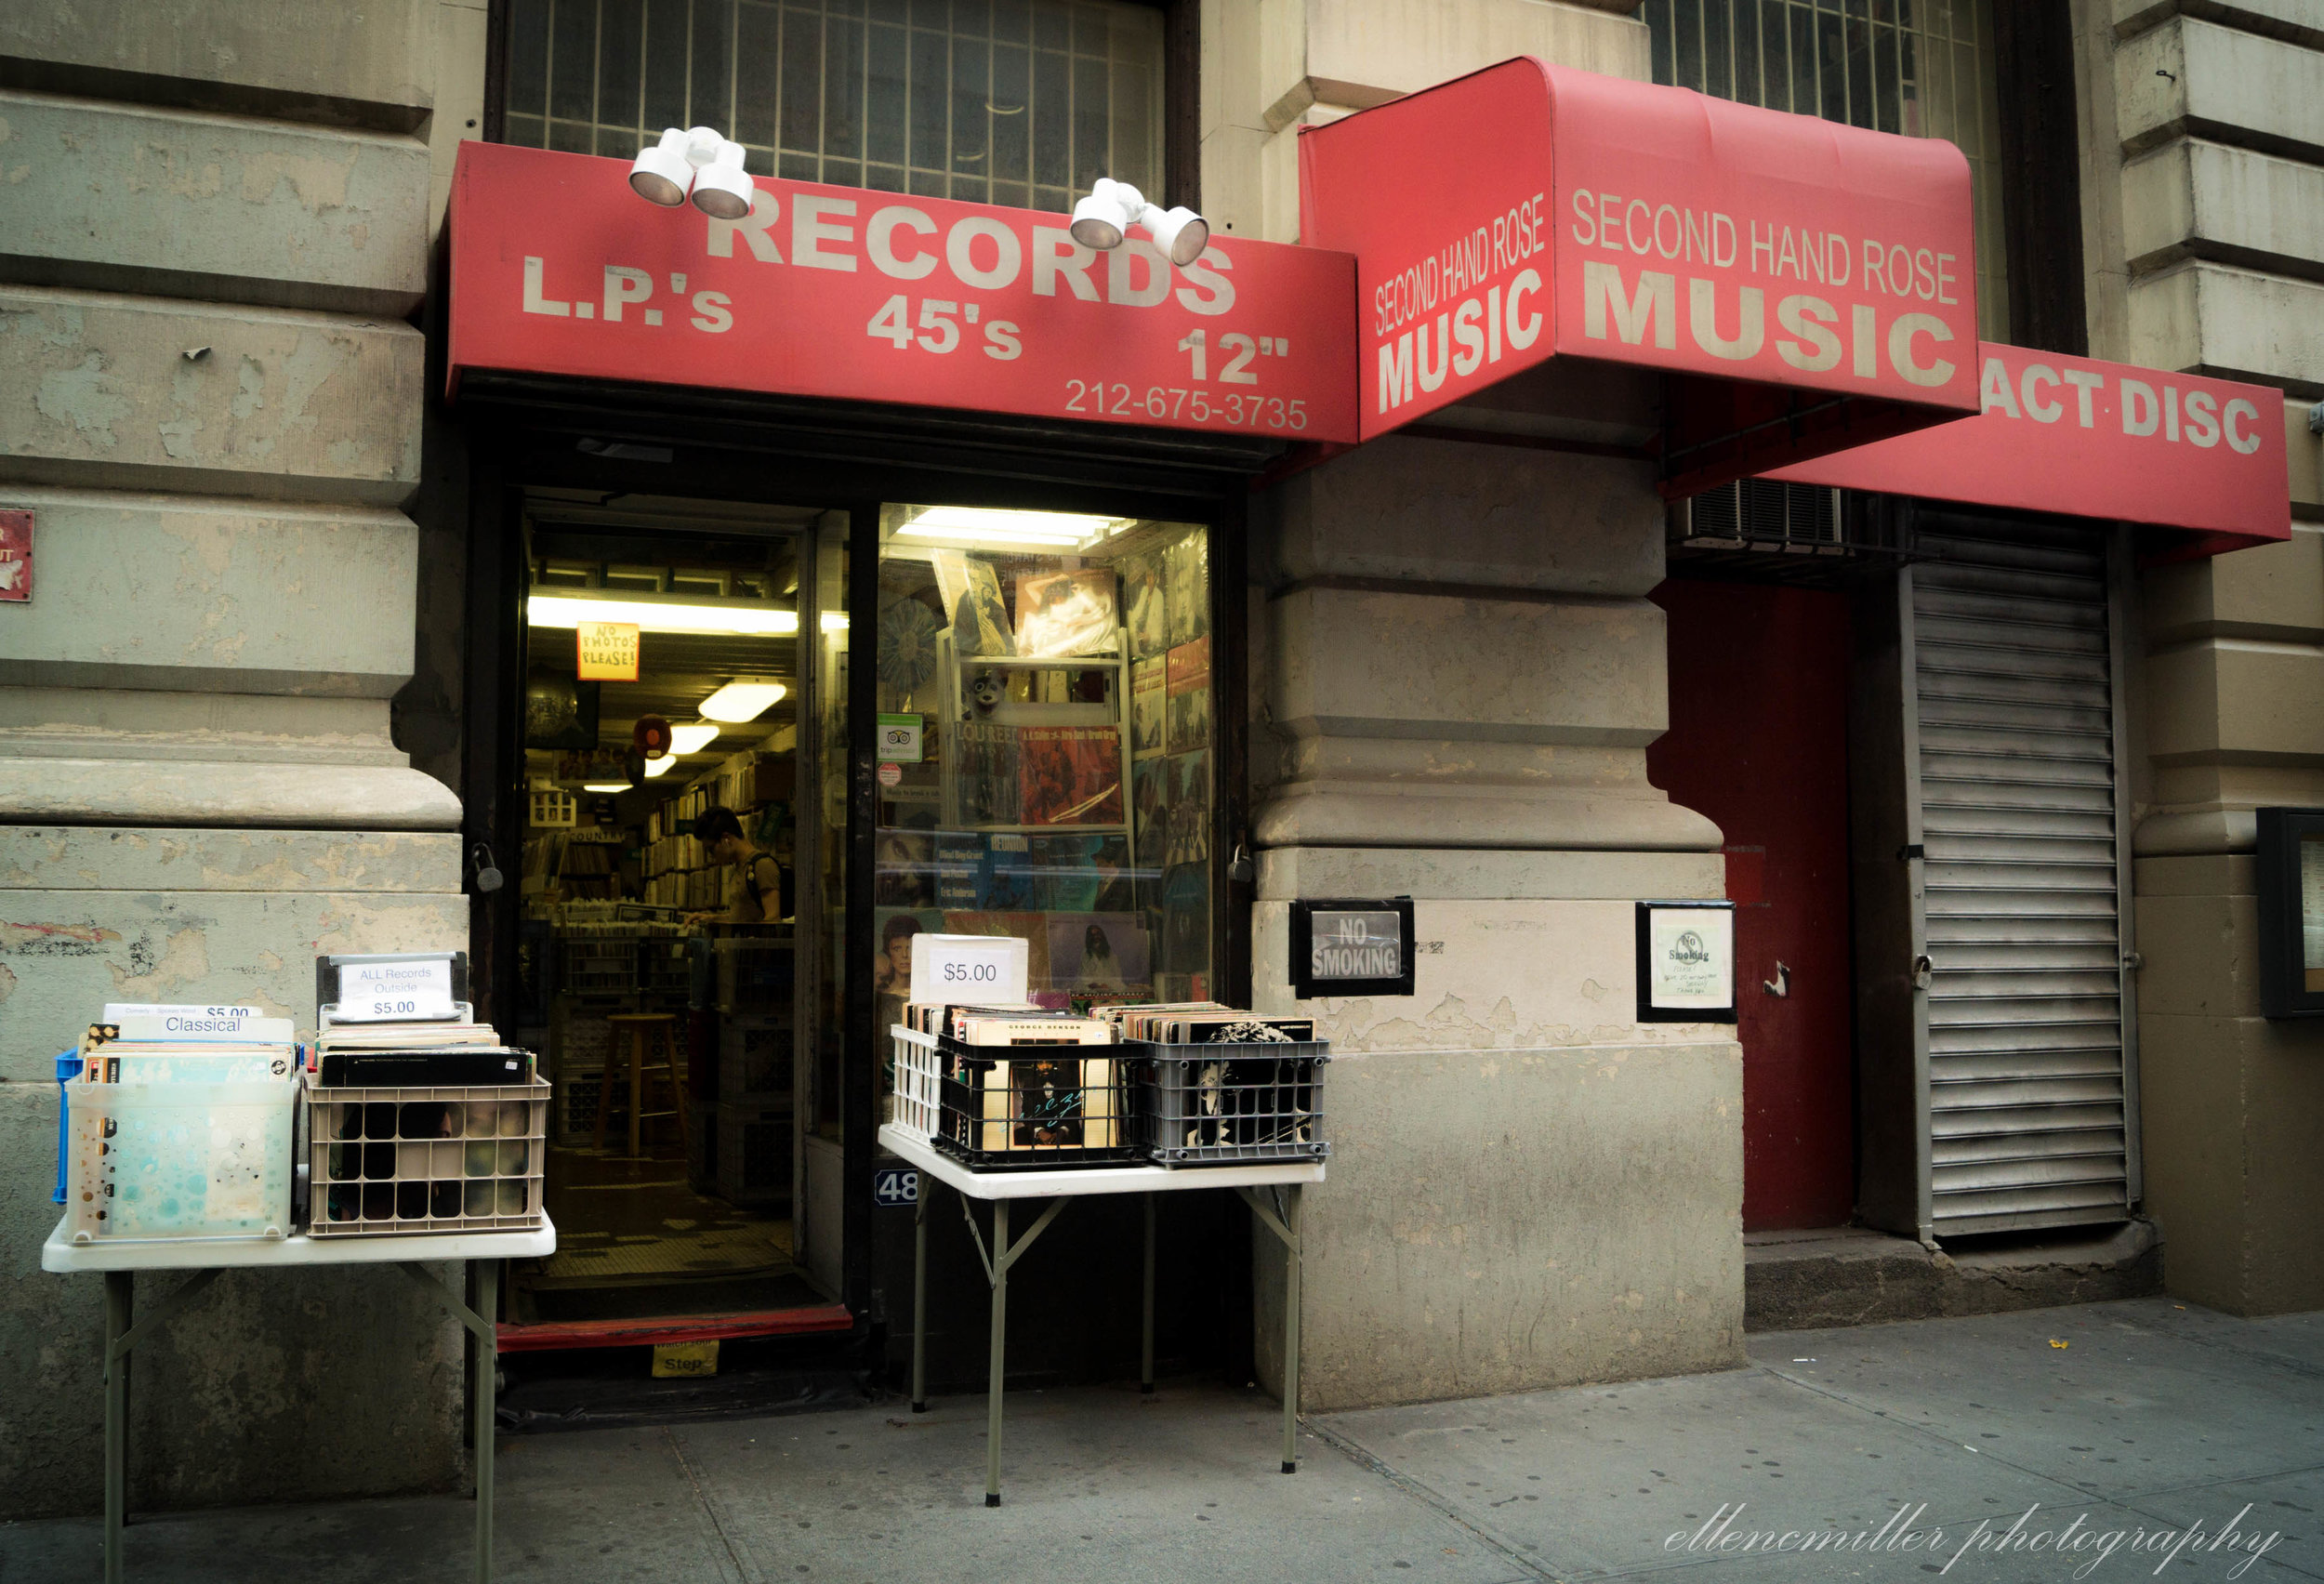 20160921-NYC-36.jpg